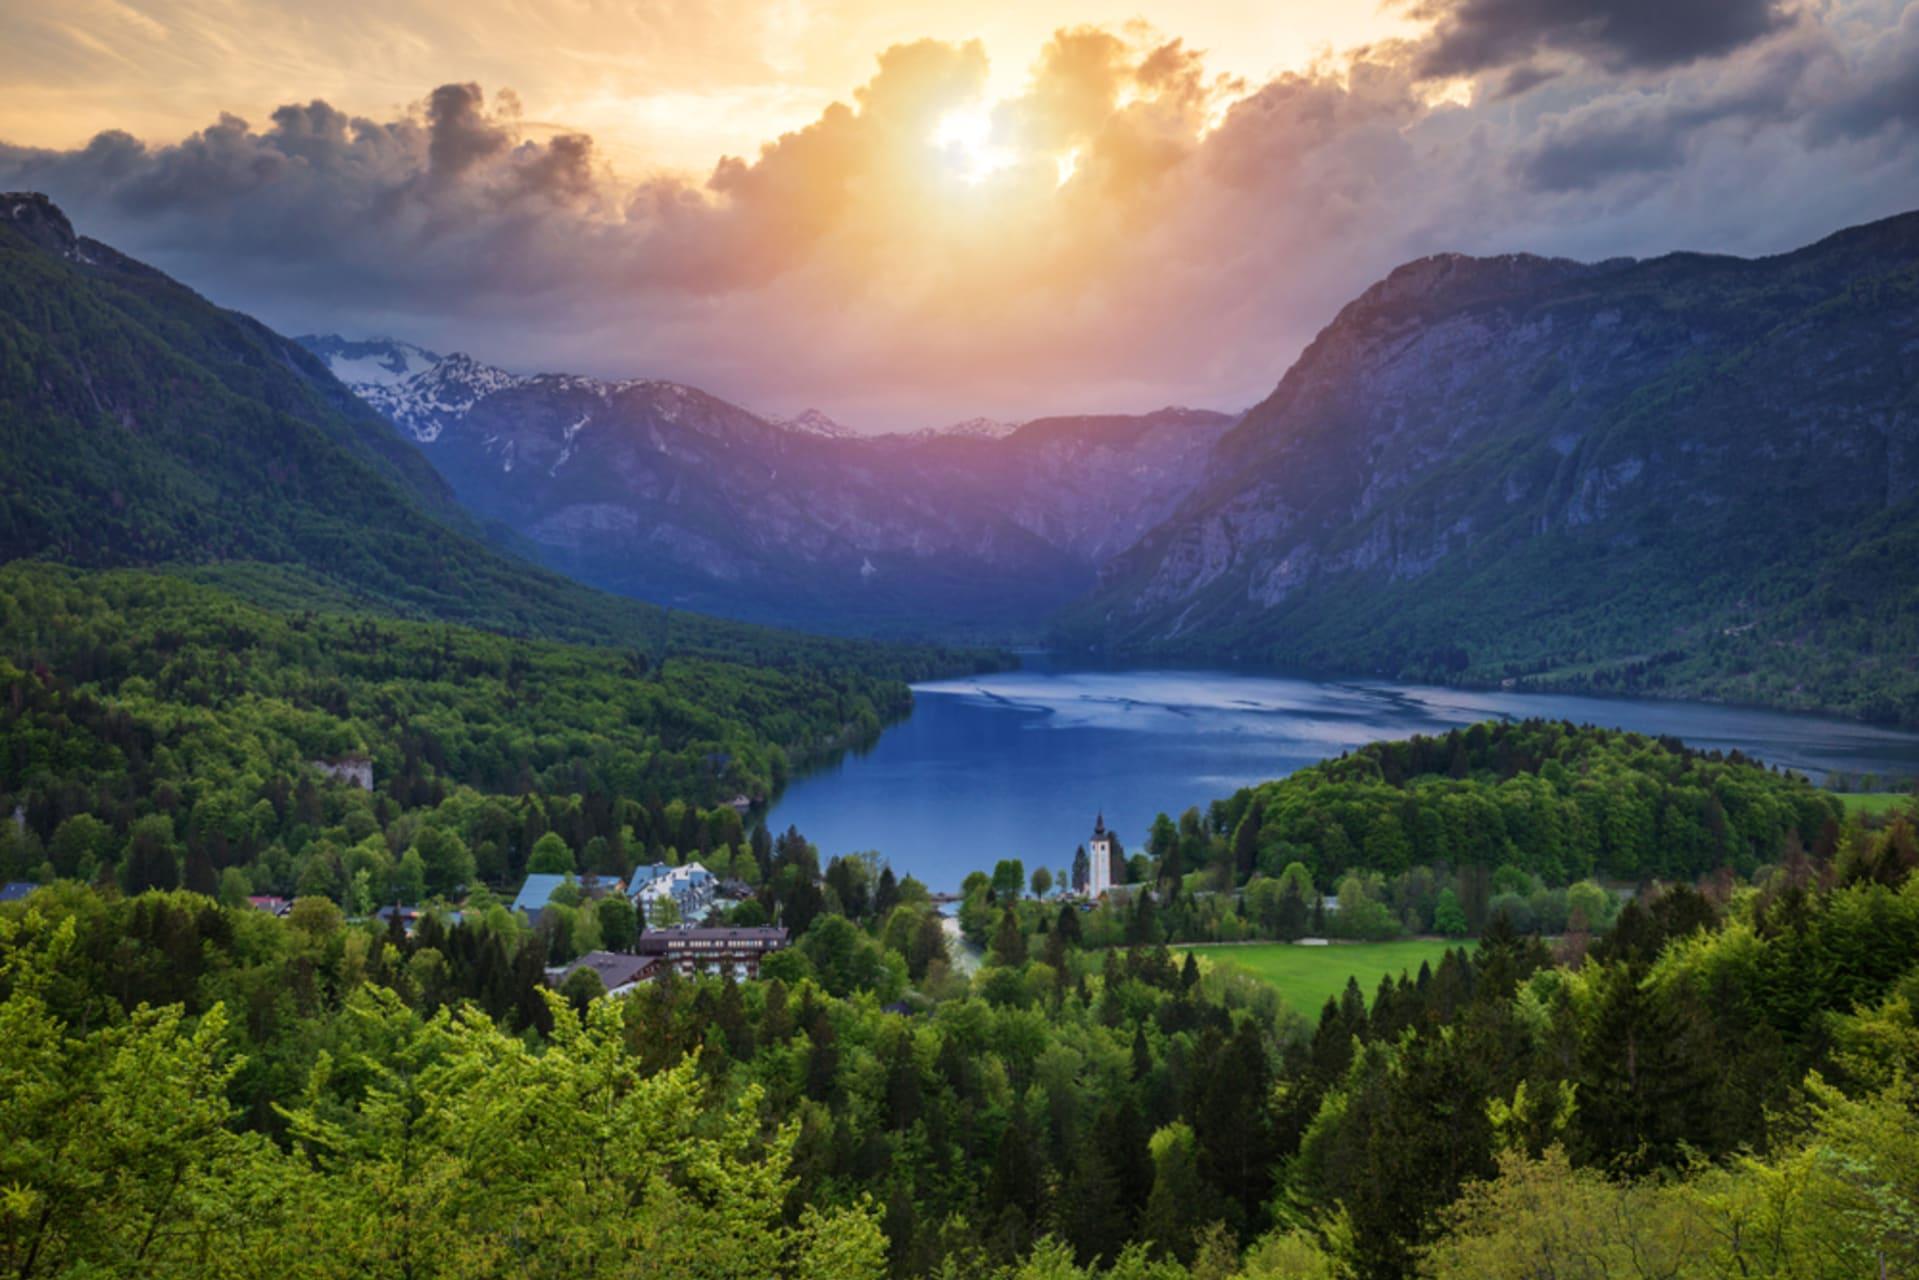 Bohinj - Bohinj, a Paradise Valley